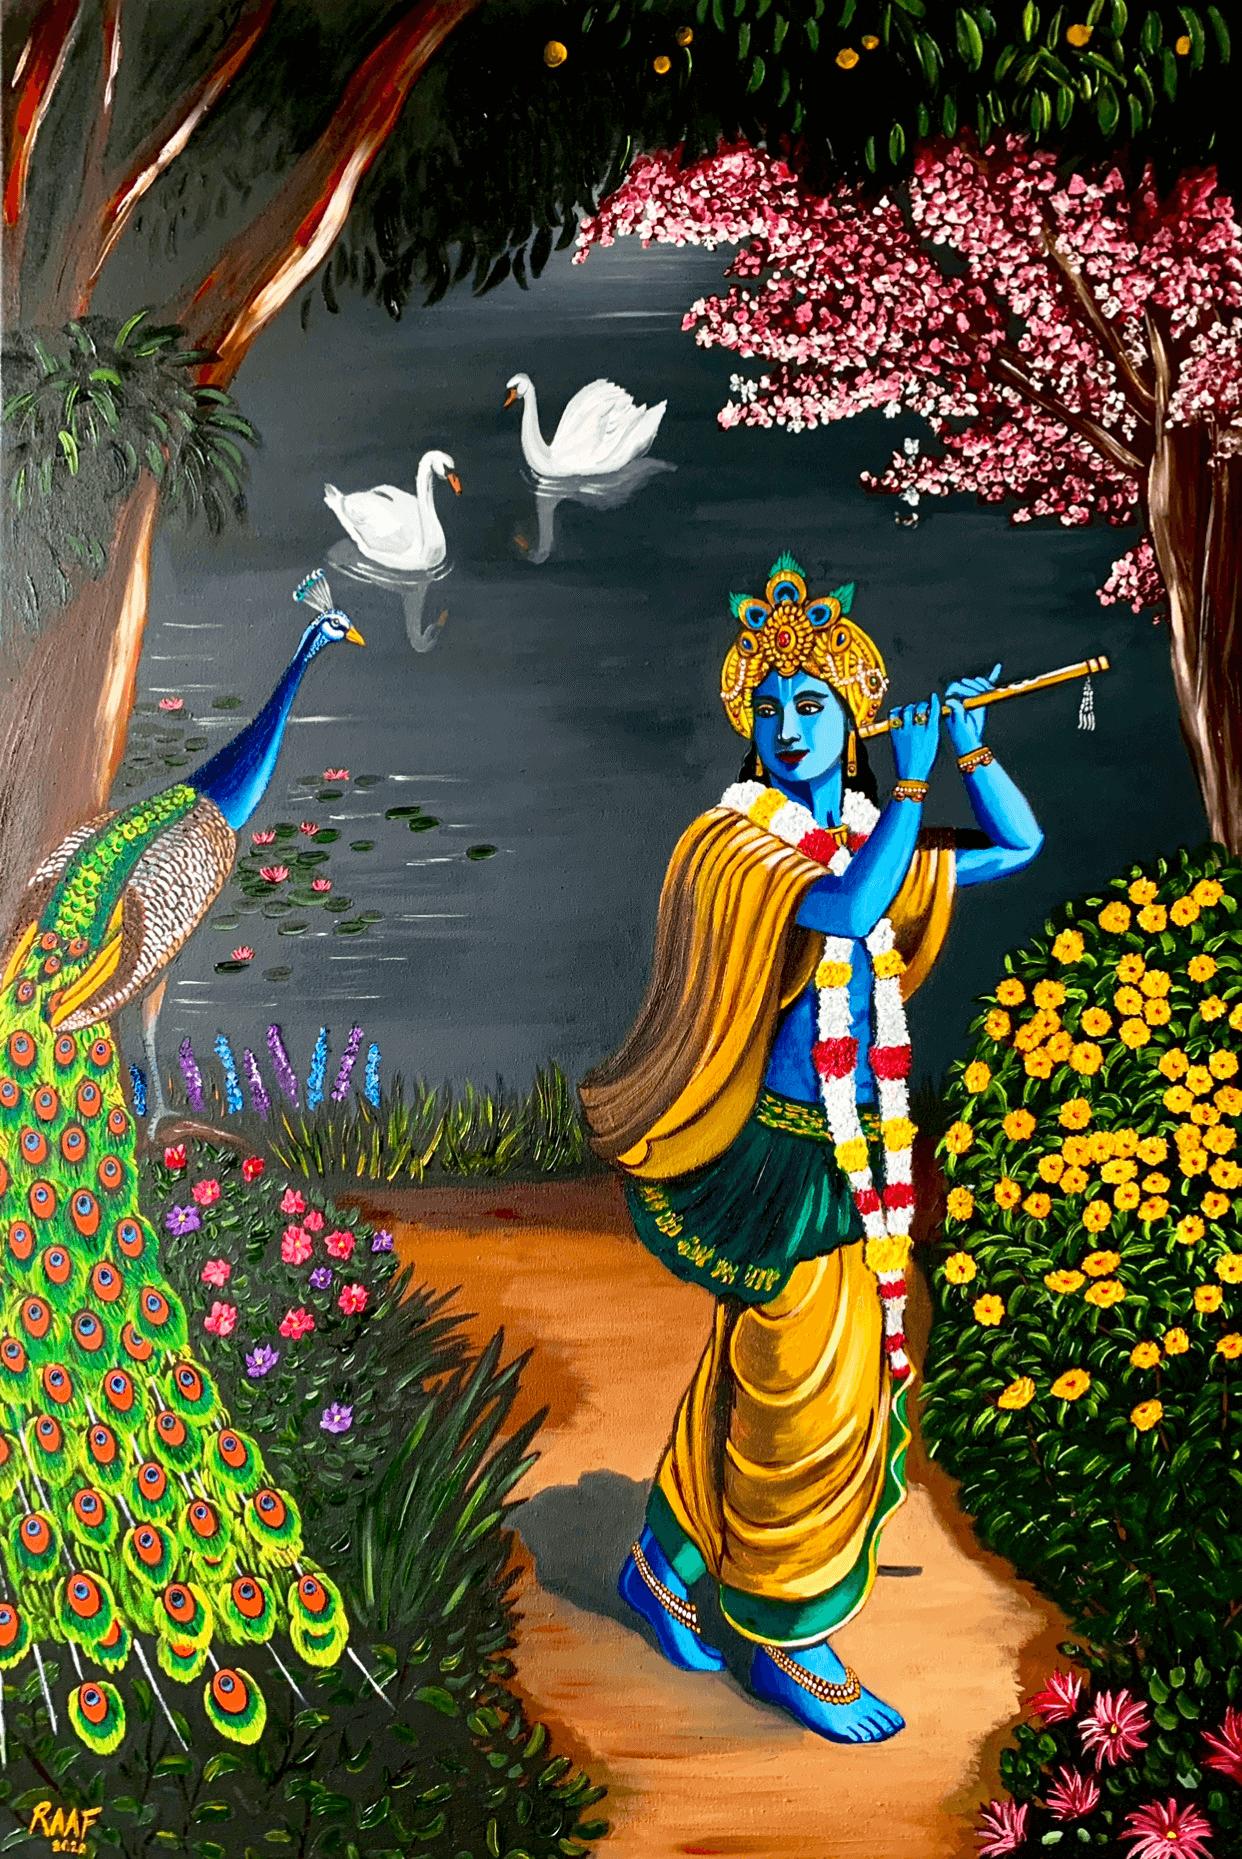 Krishna_and_peacock_oilpainting_raaf